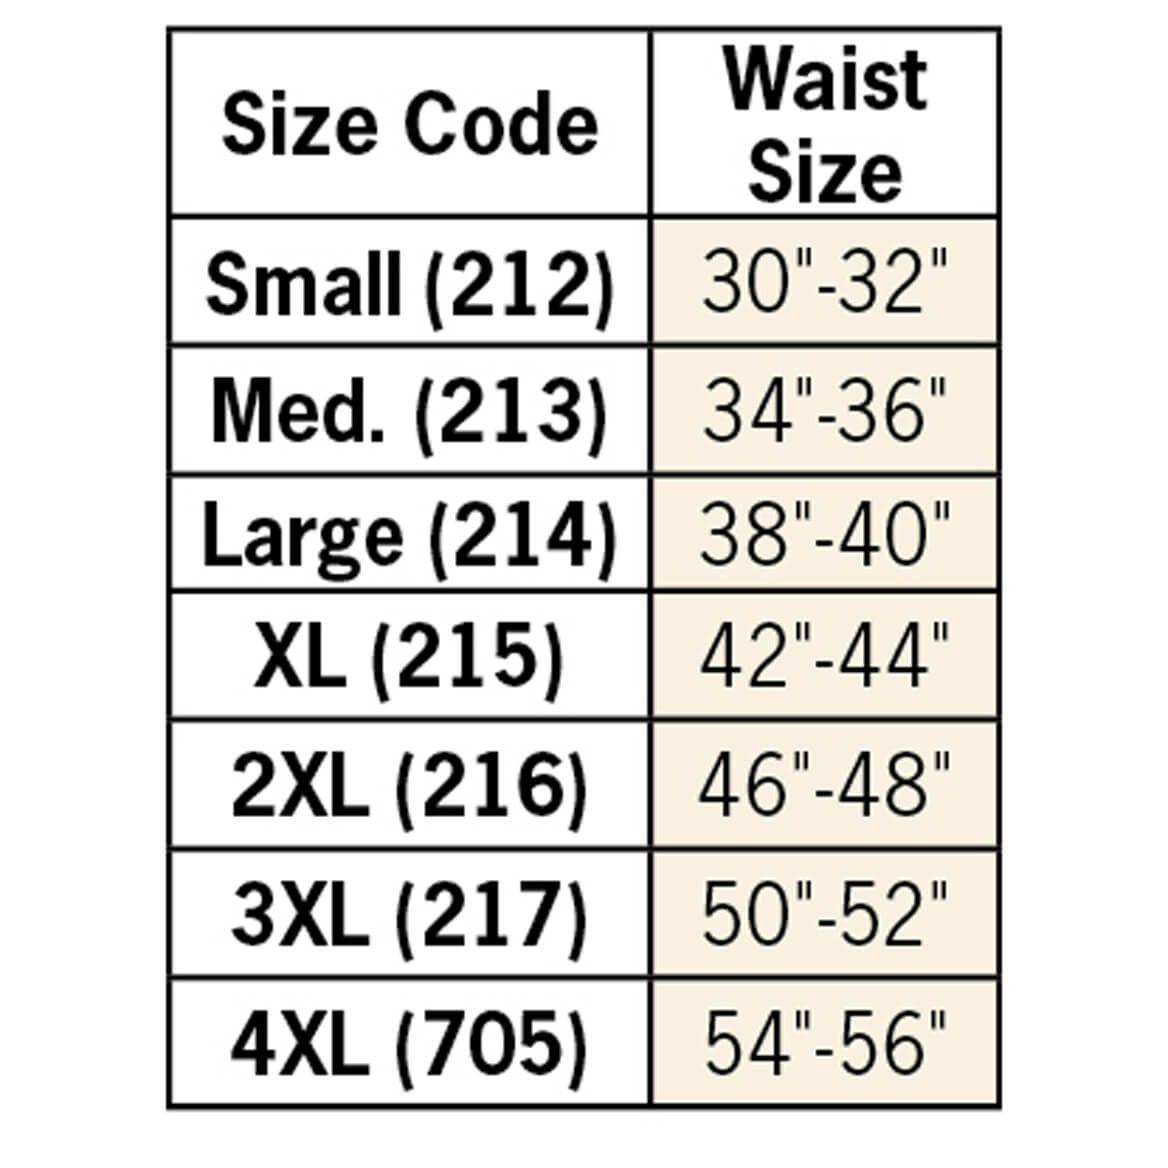 Men's 20 oz. Incontinence Briefs 3 pack Assorted Colors-362412